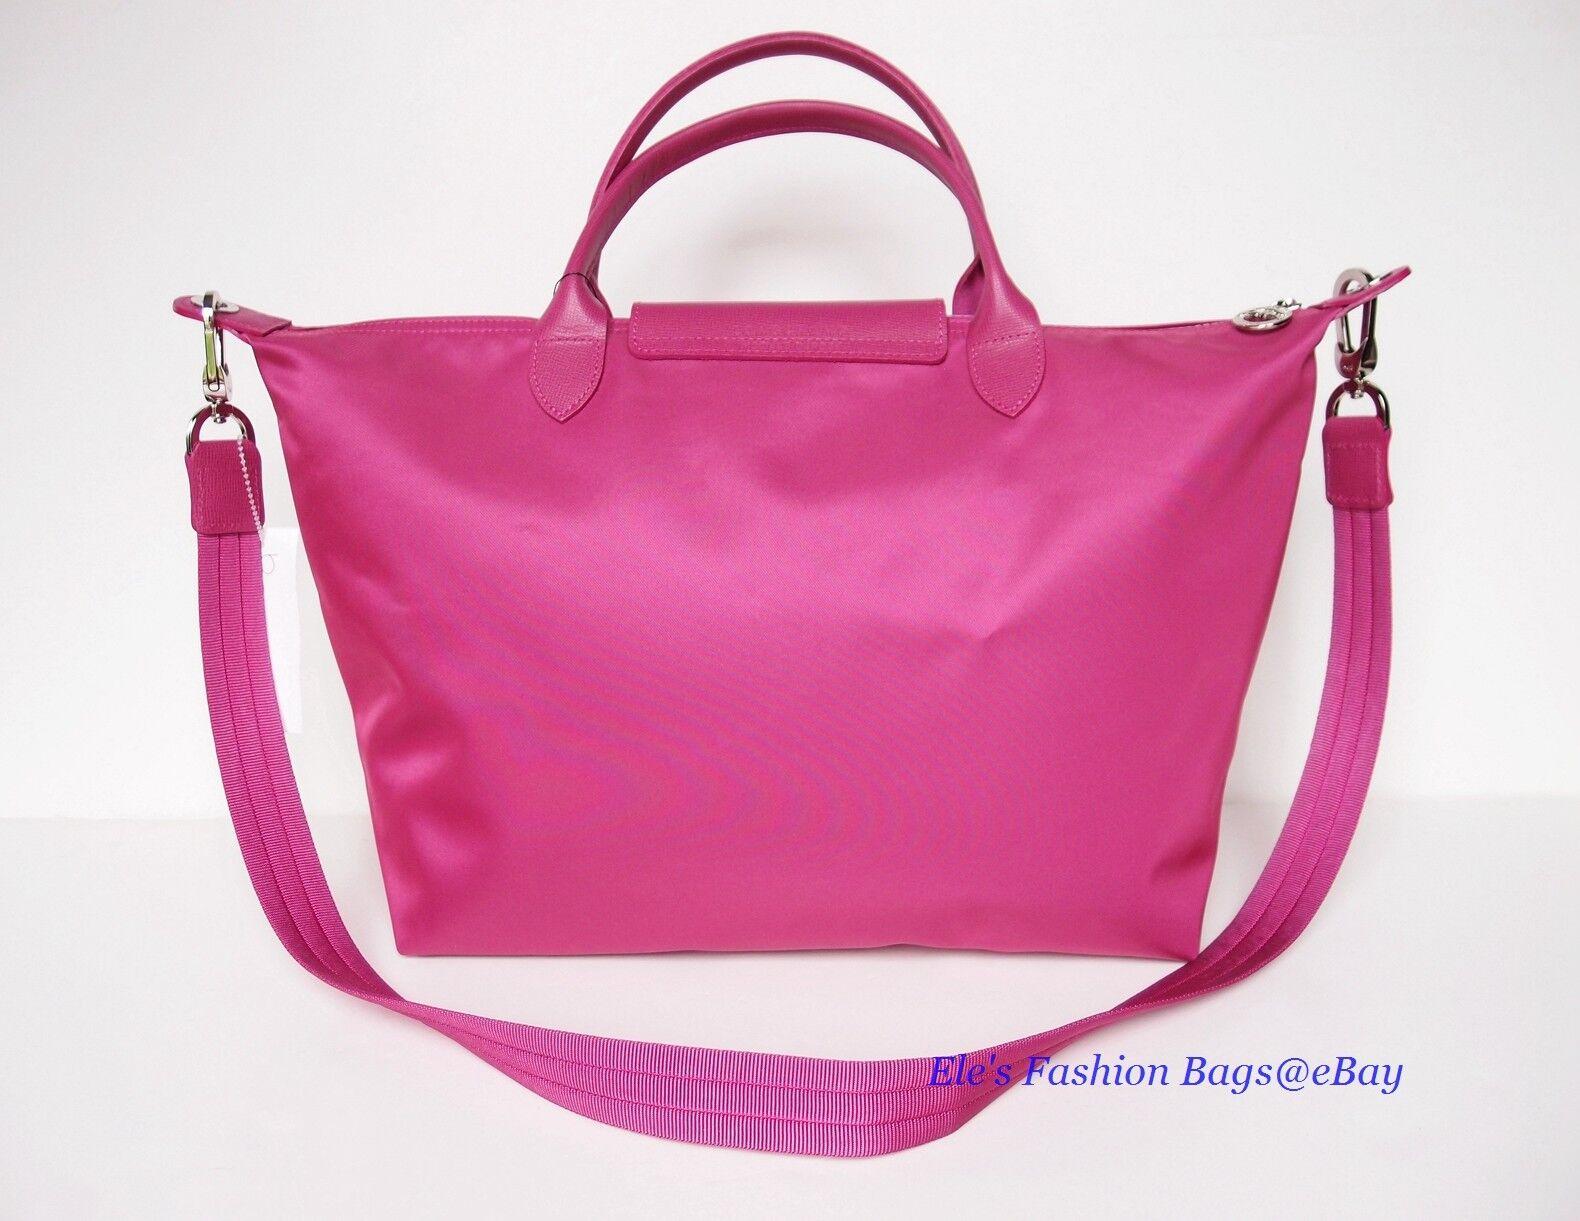 Longchamp Le Pliage Neo Tote Shoulder Bag in Hydrangea for sale online  ec5f65ac8ead6